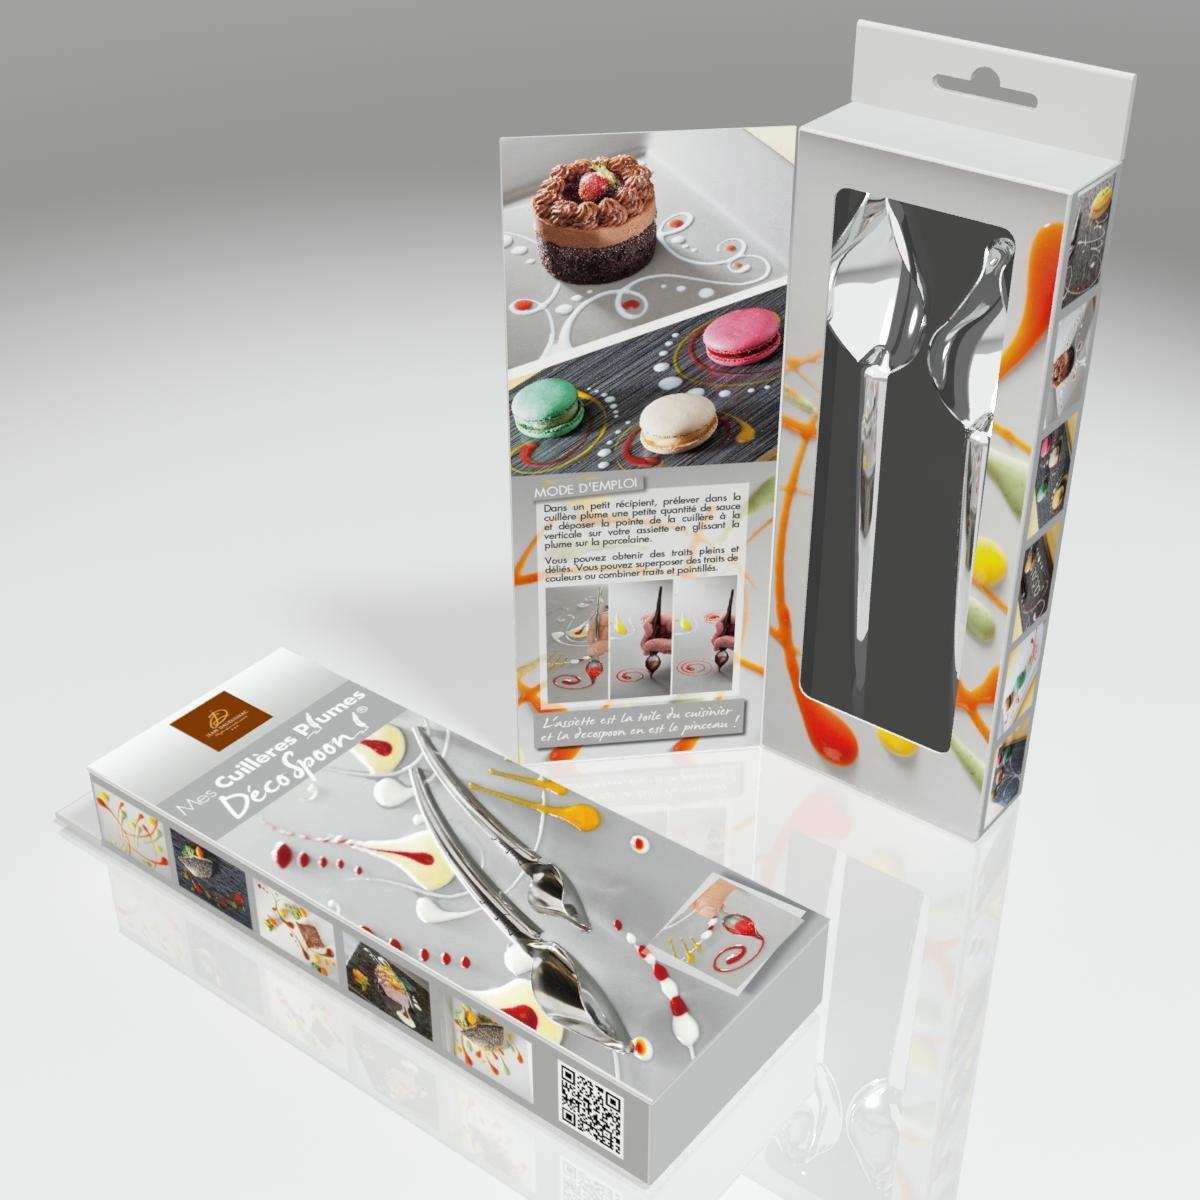 Jean Daudignac 0601050 Cucchiaio per decorare dolci e pietanze 2/pezzi acciaio INOX